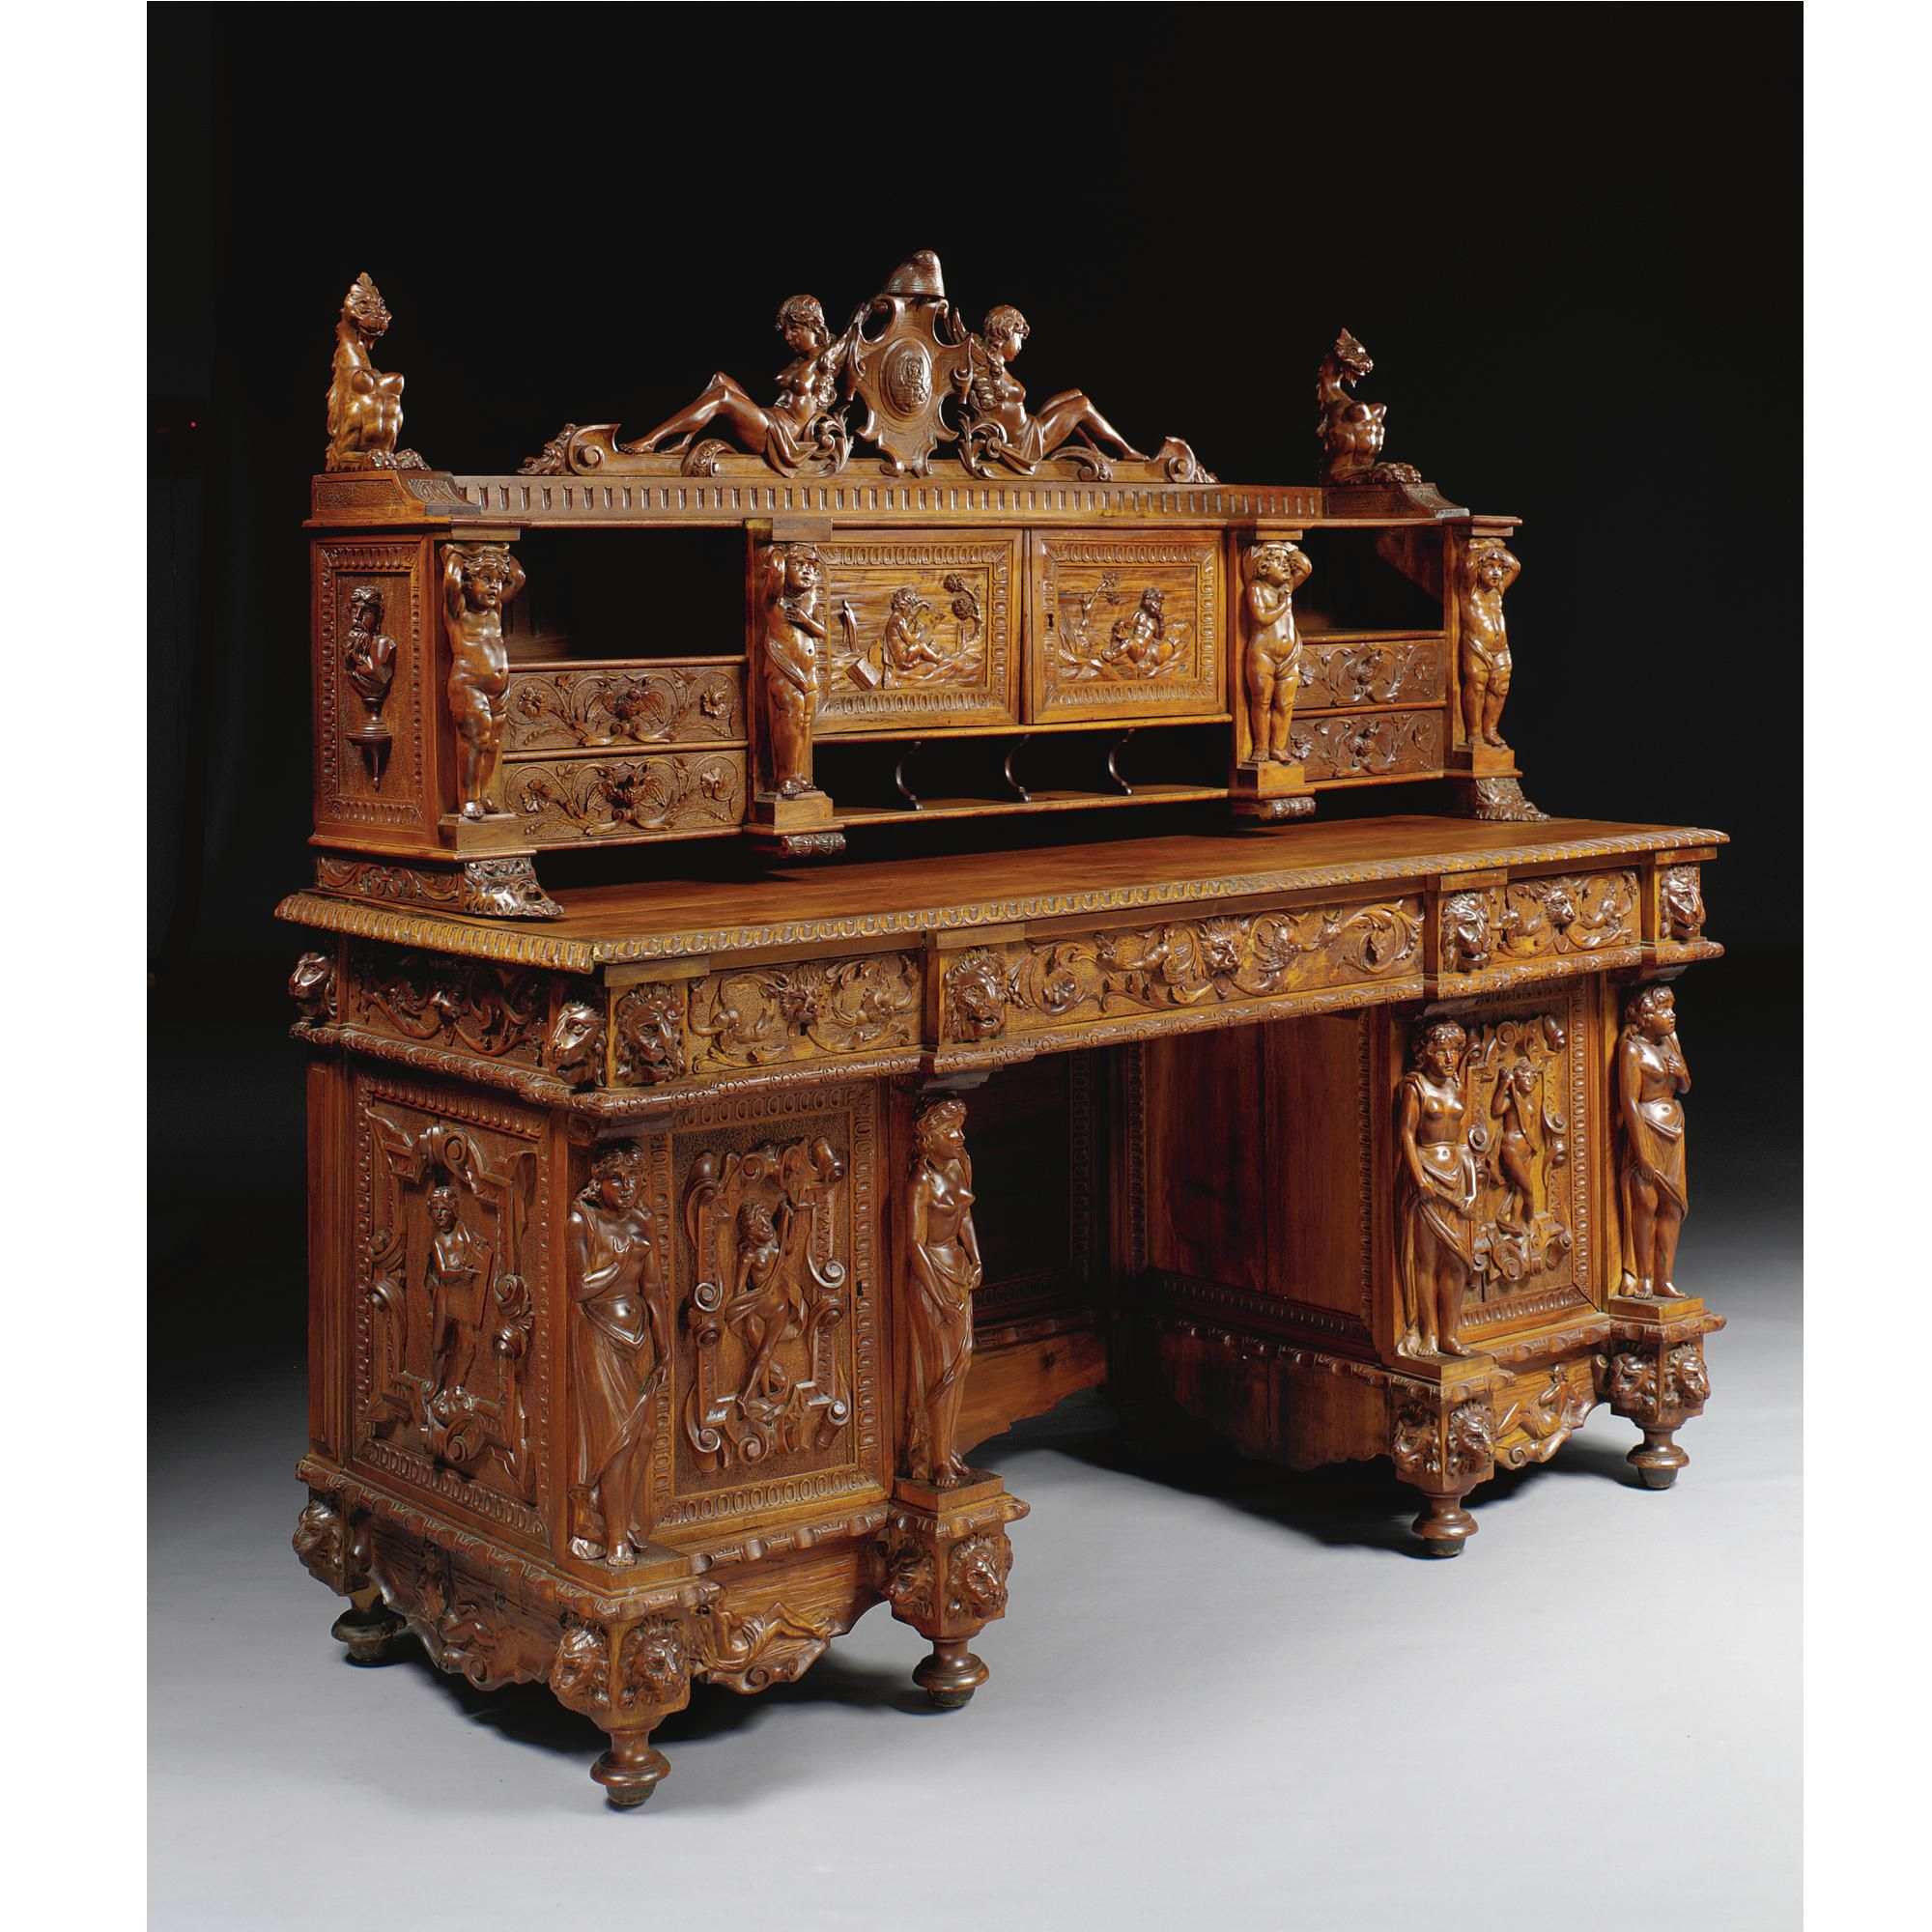 North Italian Carved Walnut Desk Early 20th Century